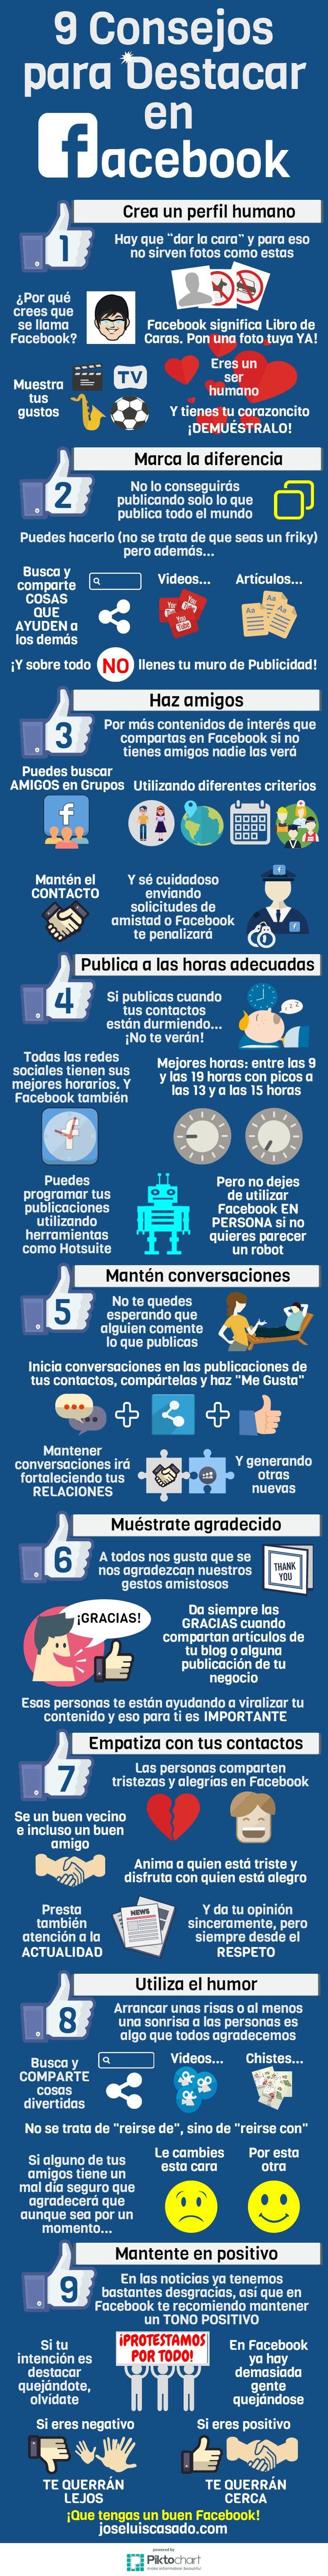 9 consejos para destacar en FaceBook #infografia http://www.rebeldesmarketingonline.com/webinar/landing_101_errores.html